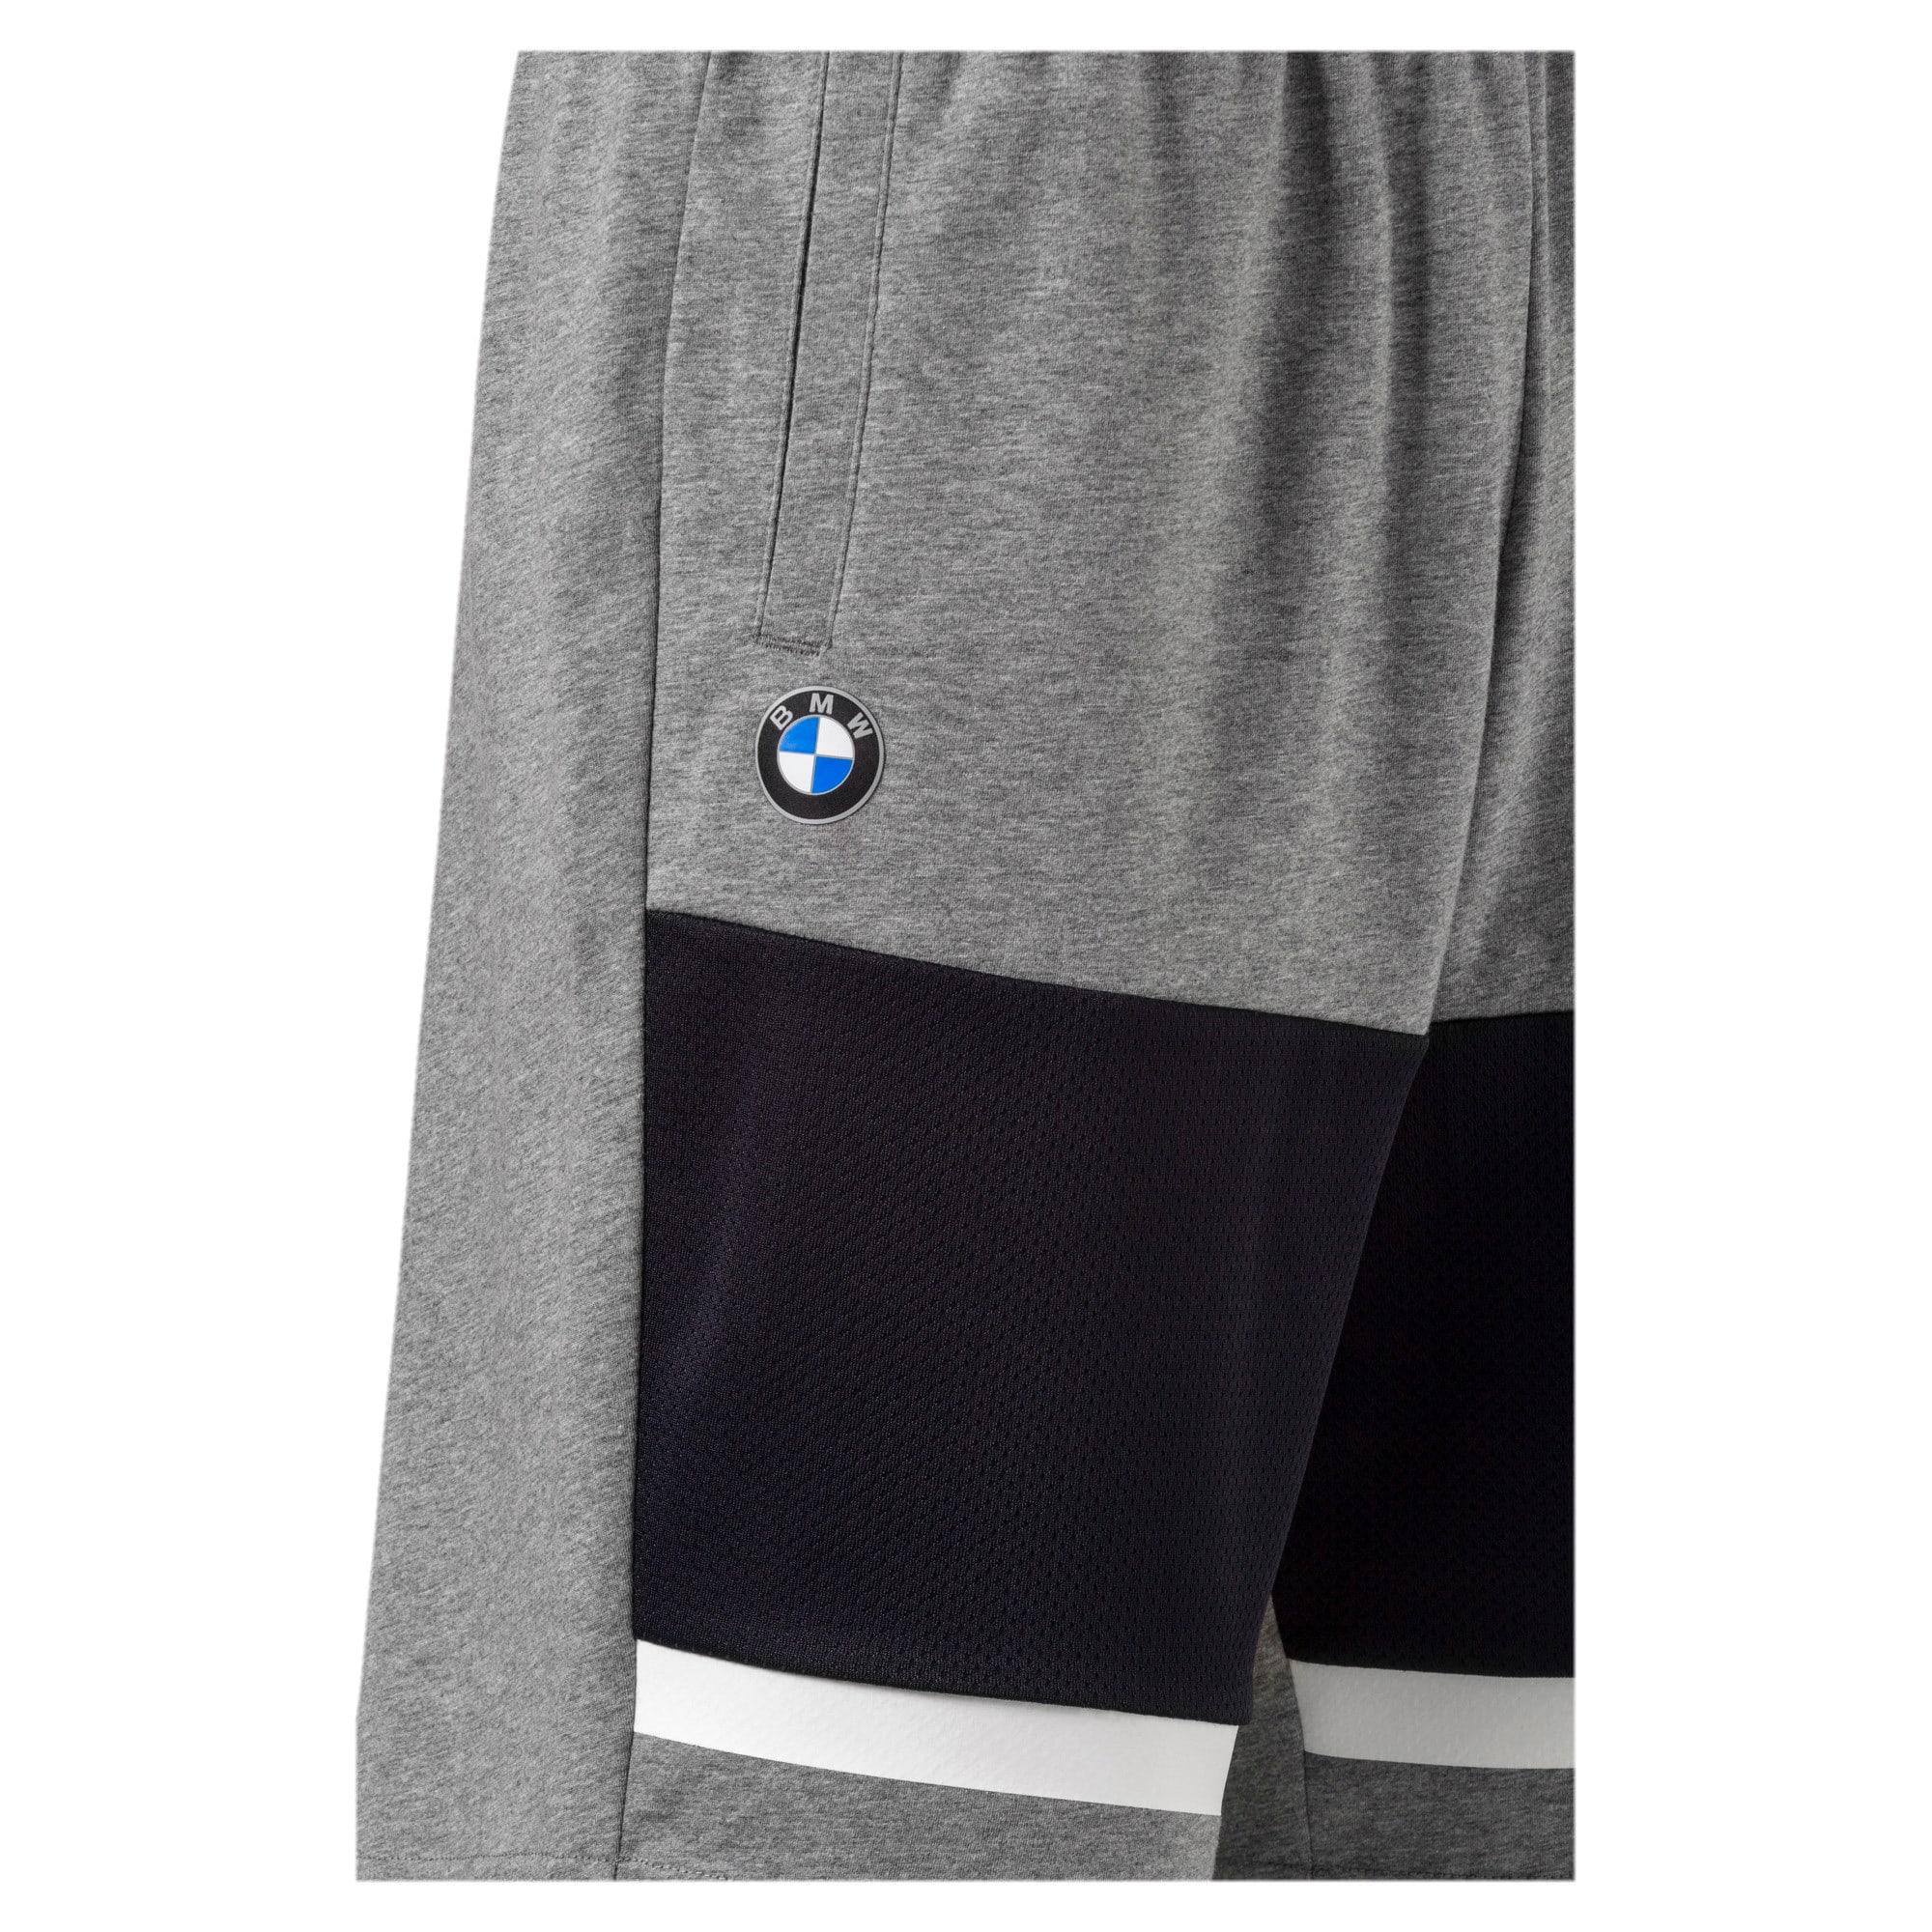 Thumbnail 3 of BMW Motorsport Men's Sweat Shorts, Medium Gray Heather, medium-IND